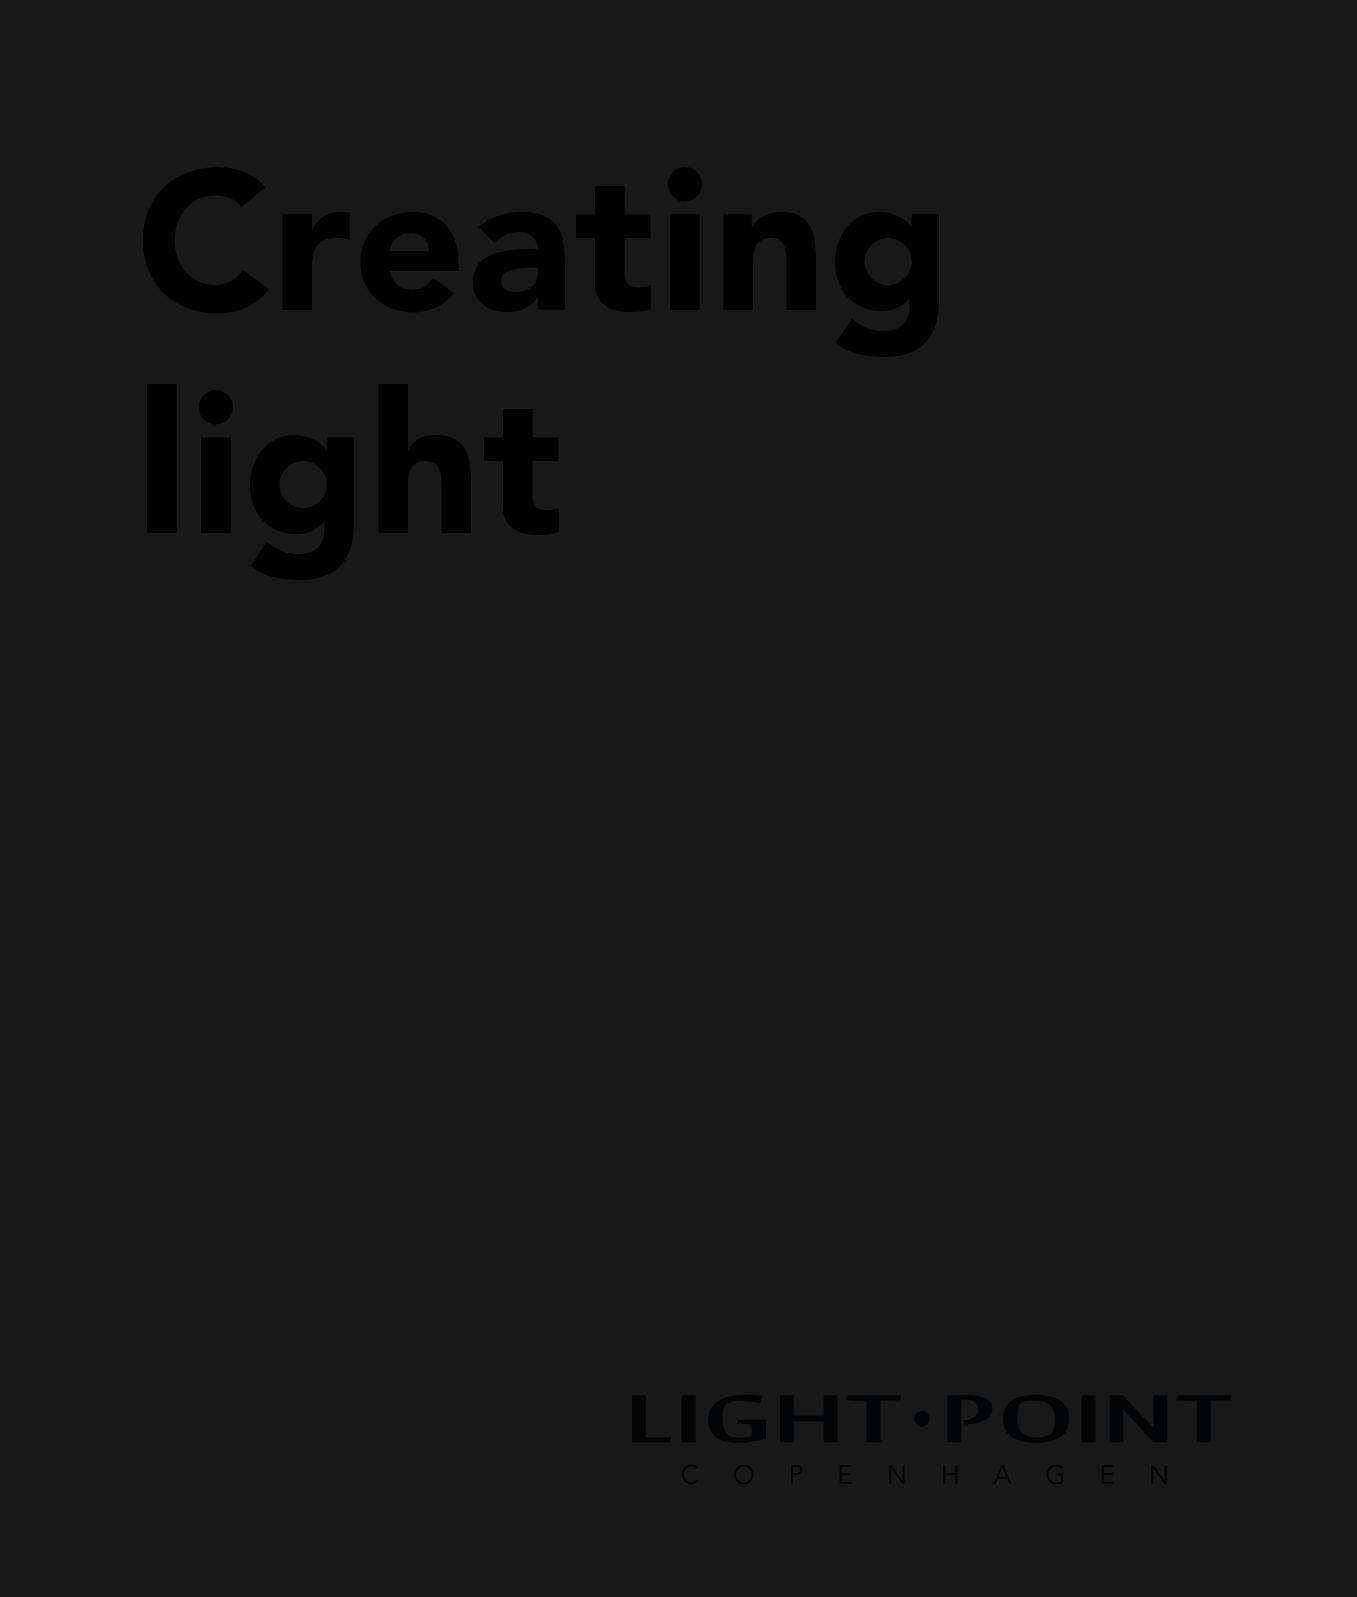 Light Point